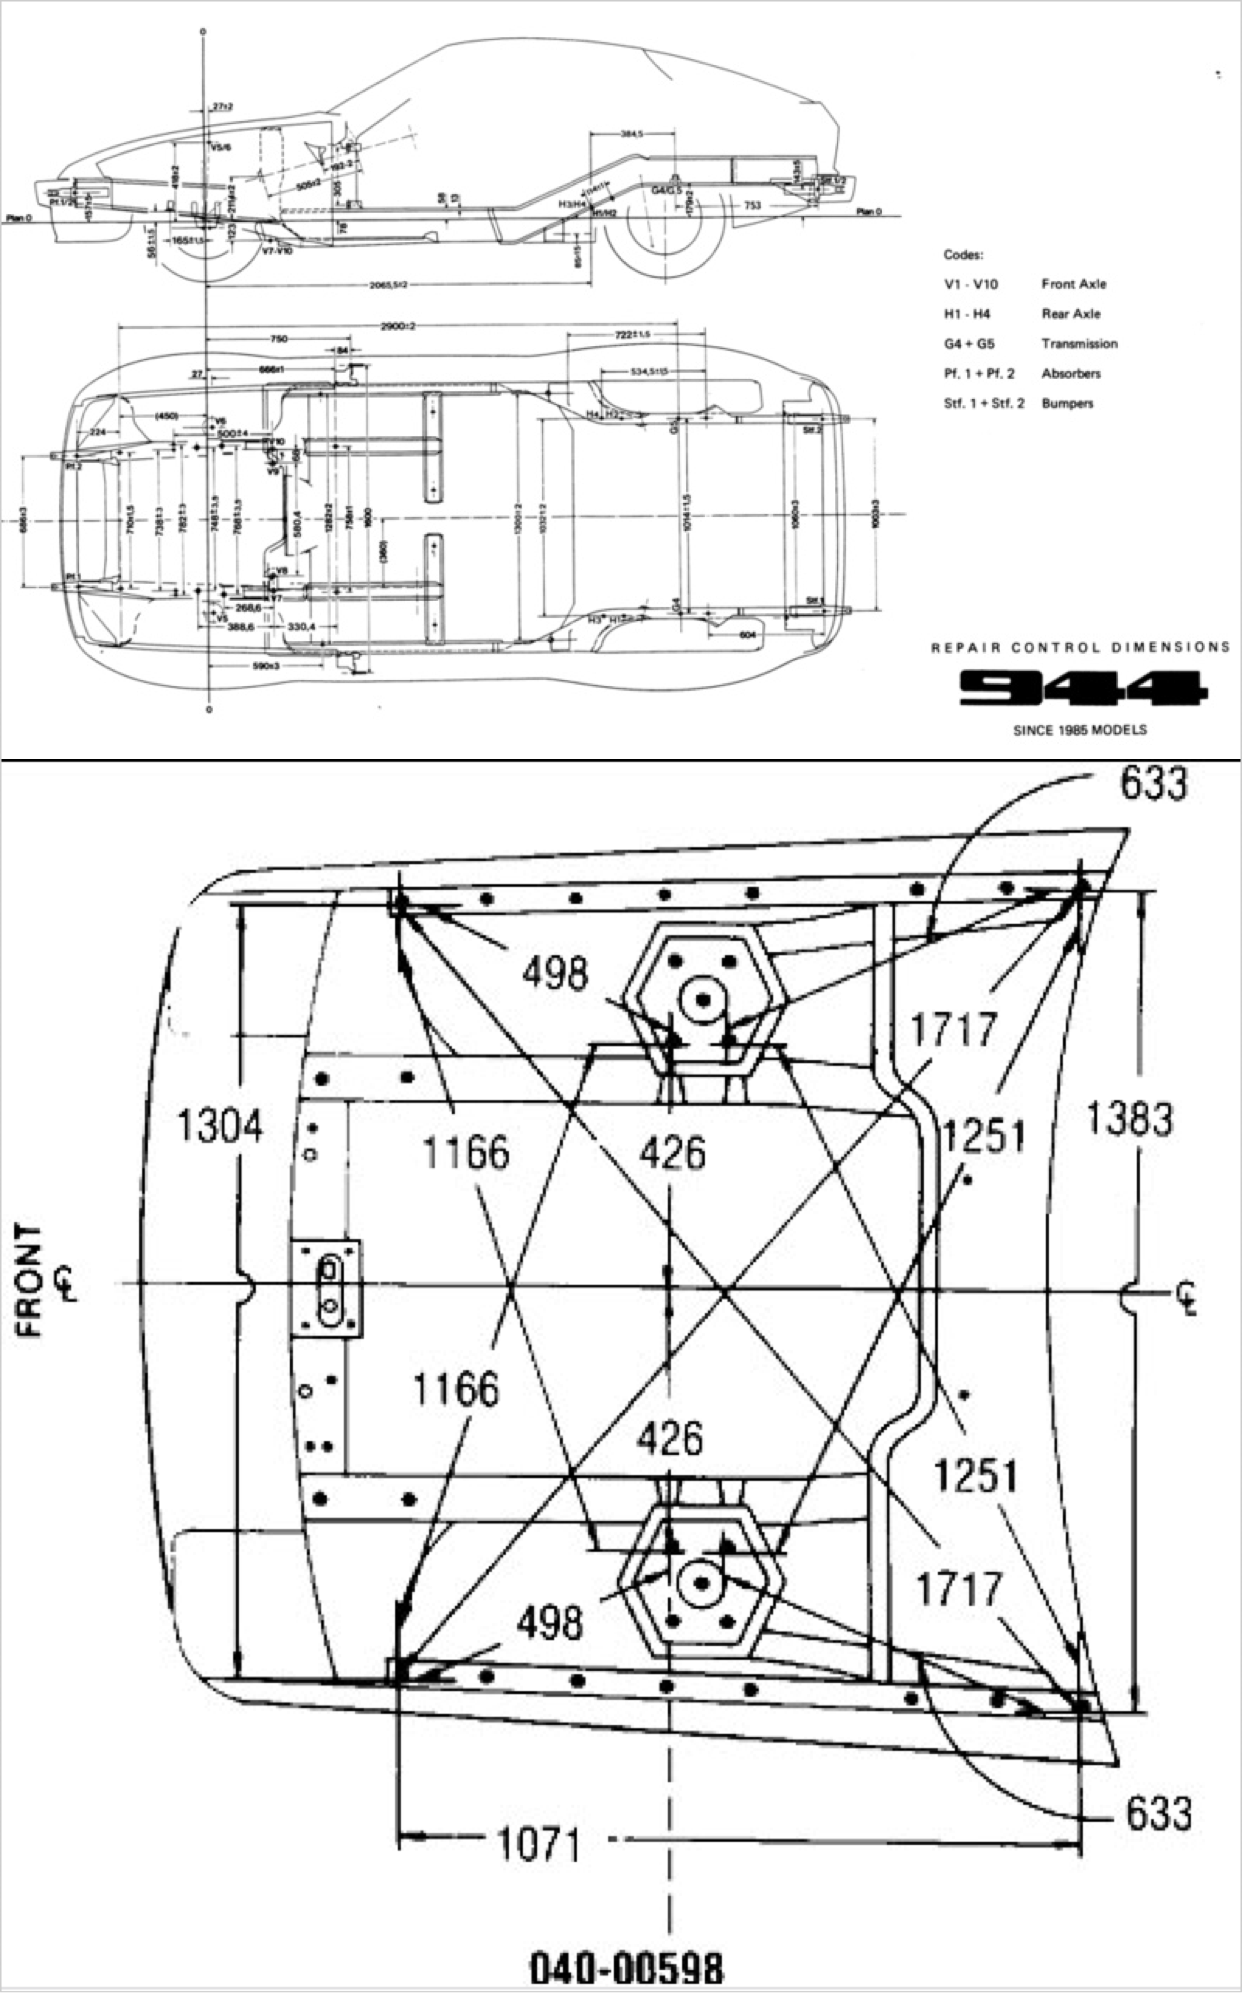 small resolution of porsche 944 repair control dimensions front detail porsche porsche 911 engine diagram further porsche 924 transmission diagram